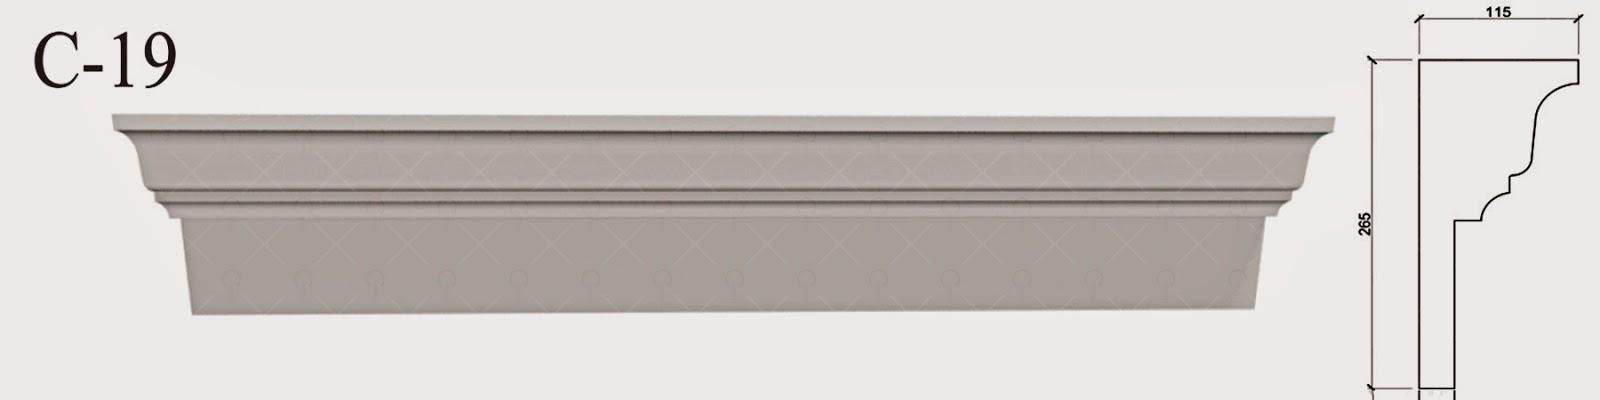 Cornisa Moderna - Baghete Polistiren pentru fatade case pret, profile decorative personalizate